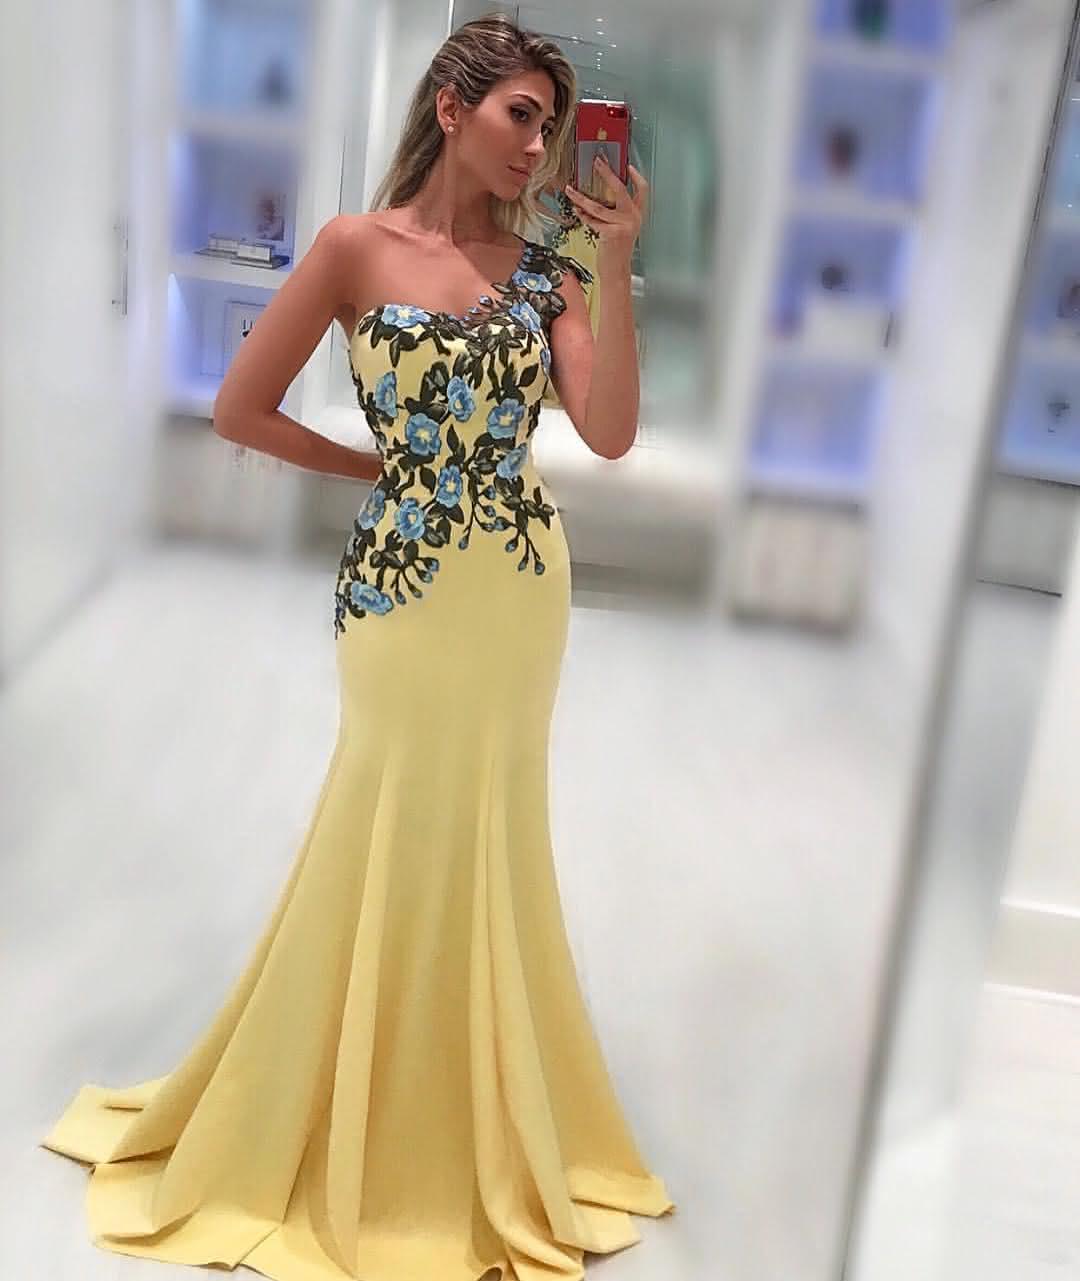 Vestido para casamento de dia convidada 2019